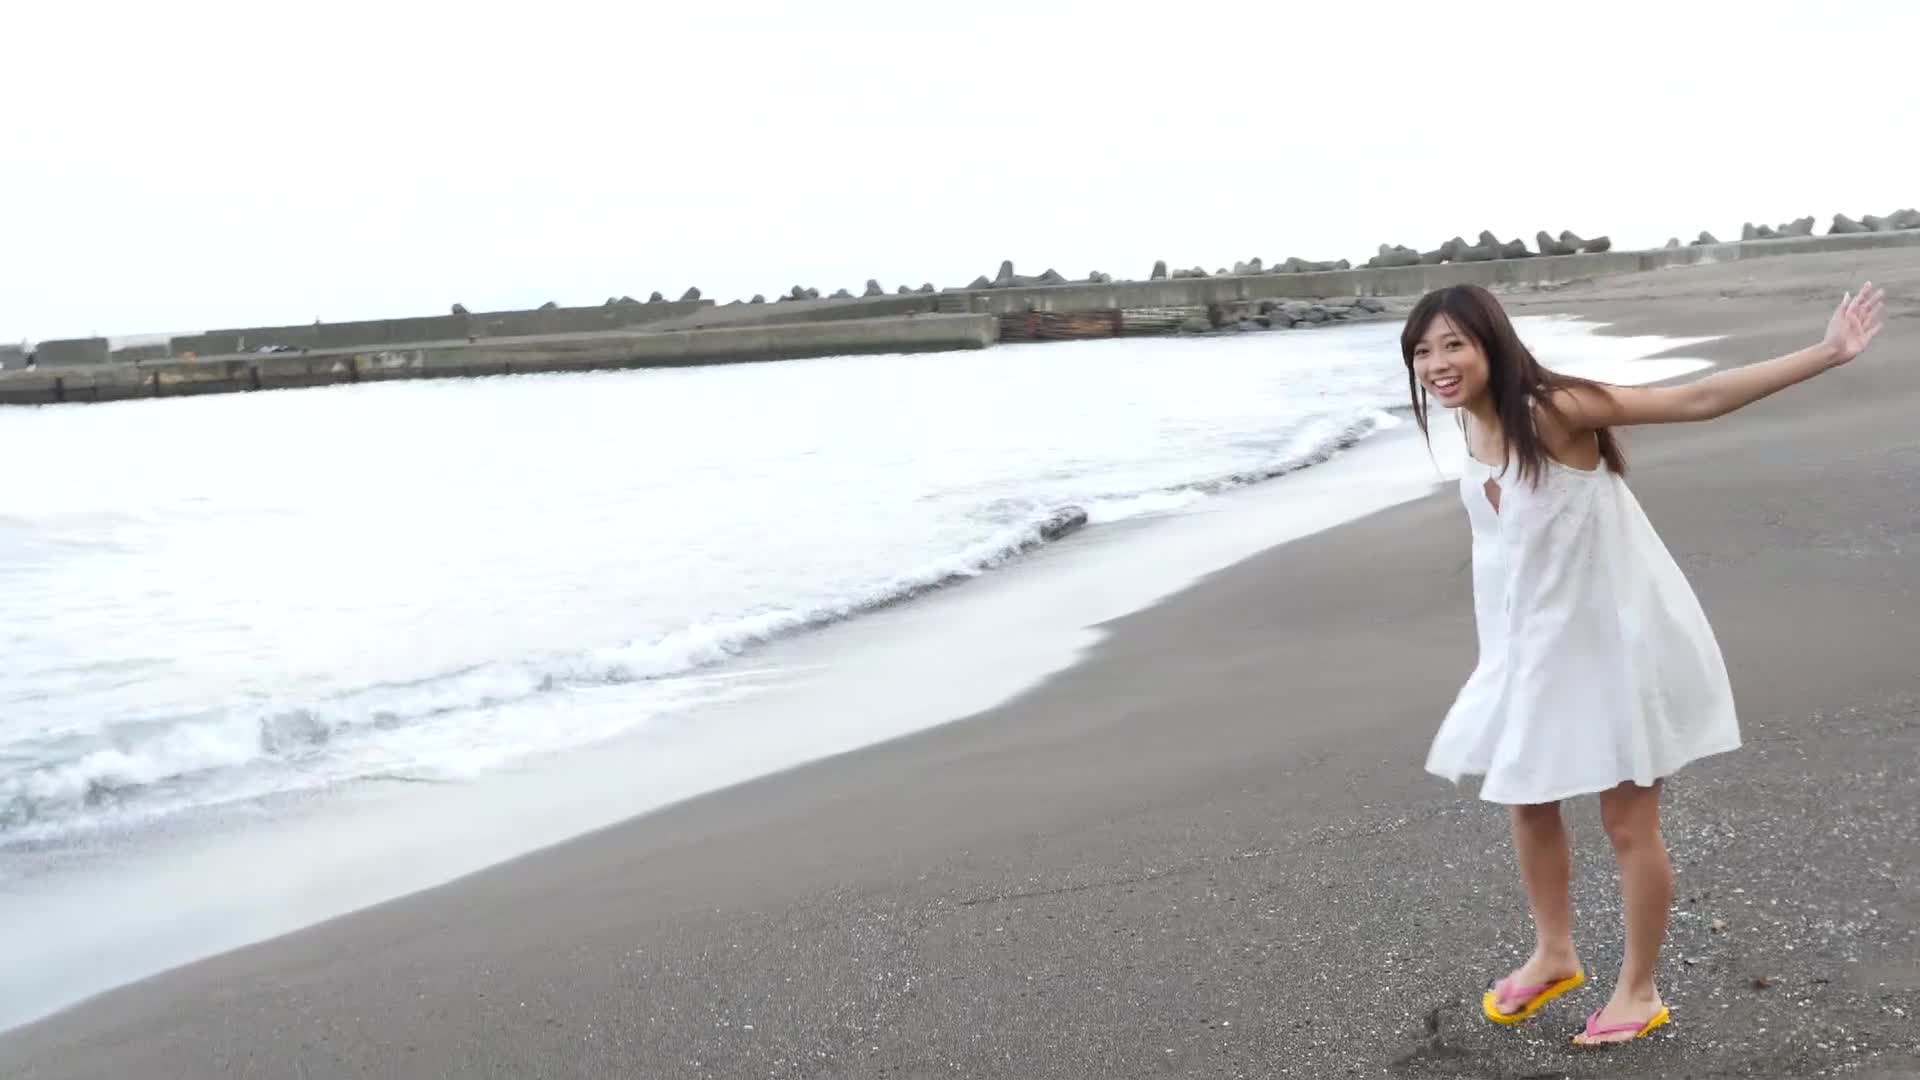 c14 - 乙女の恋心/大貫彩香